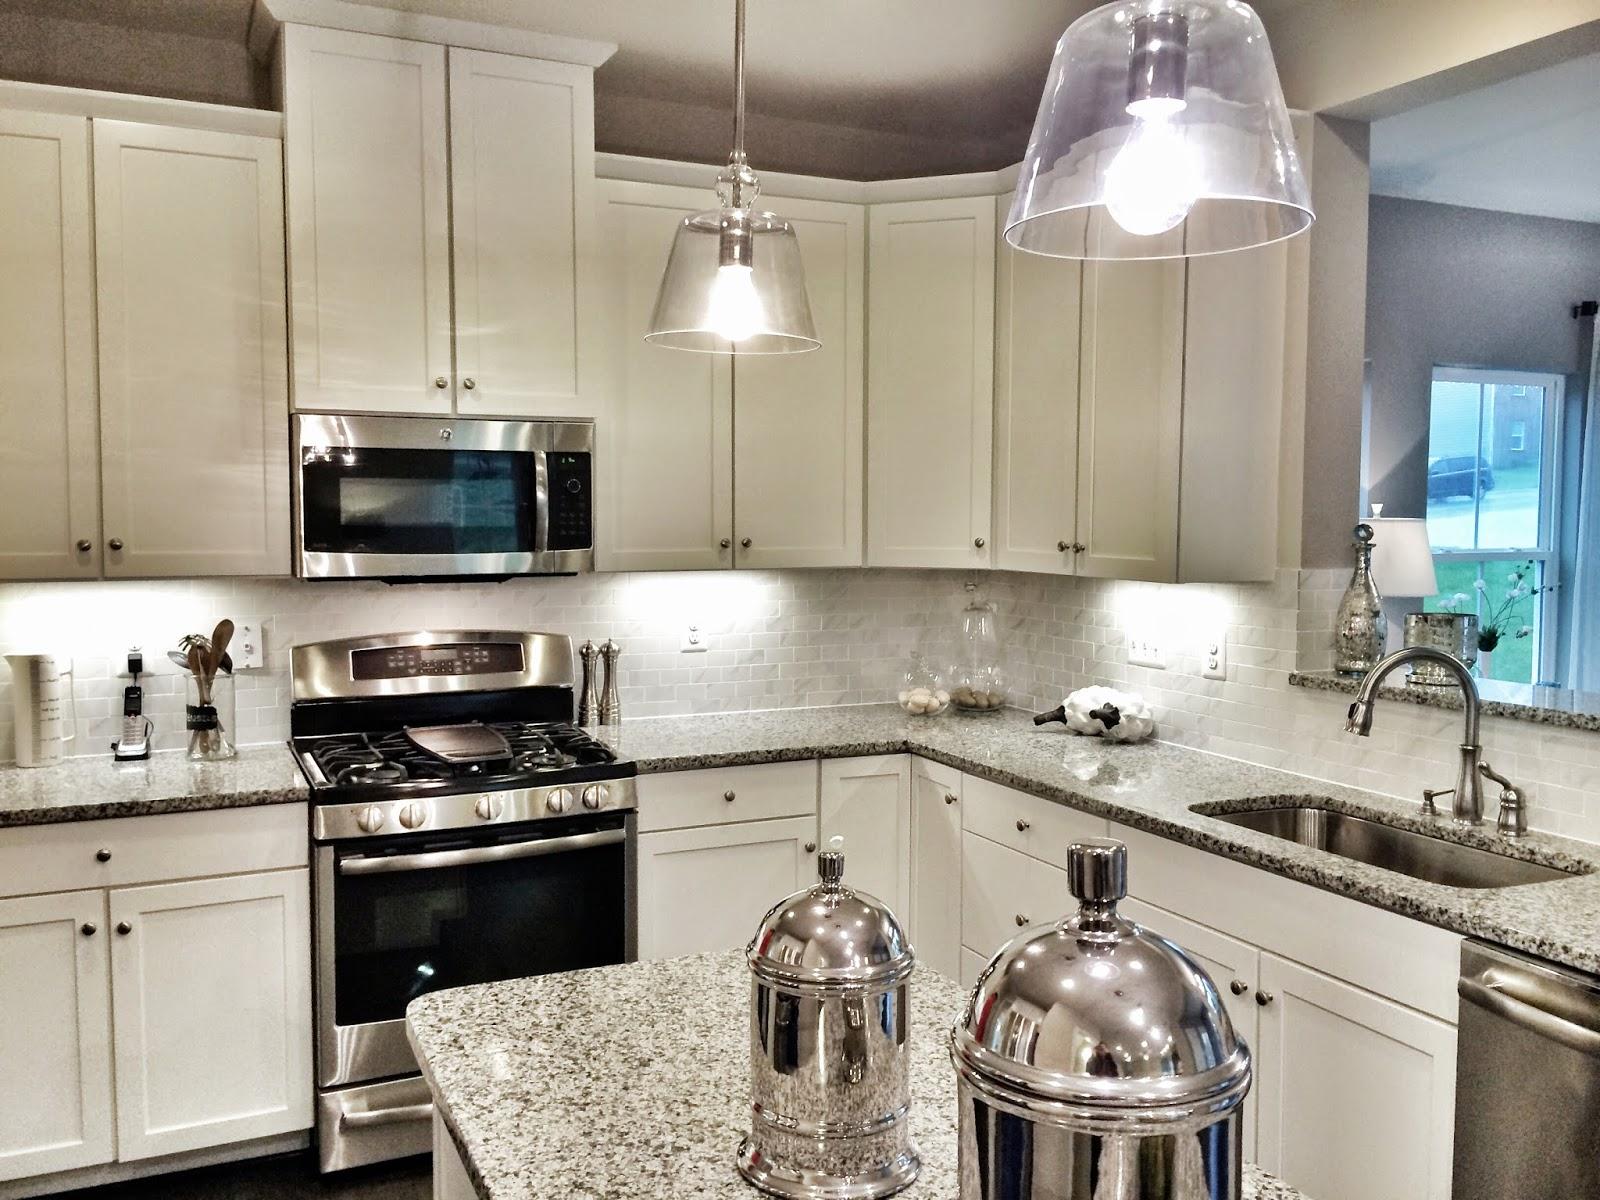 kitchens in new homes stone kitchen backsplash citrus 43 spice may 2014